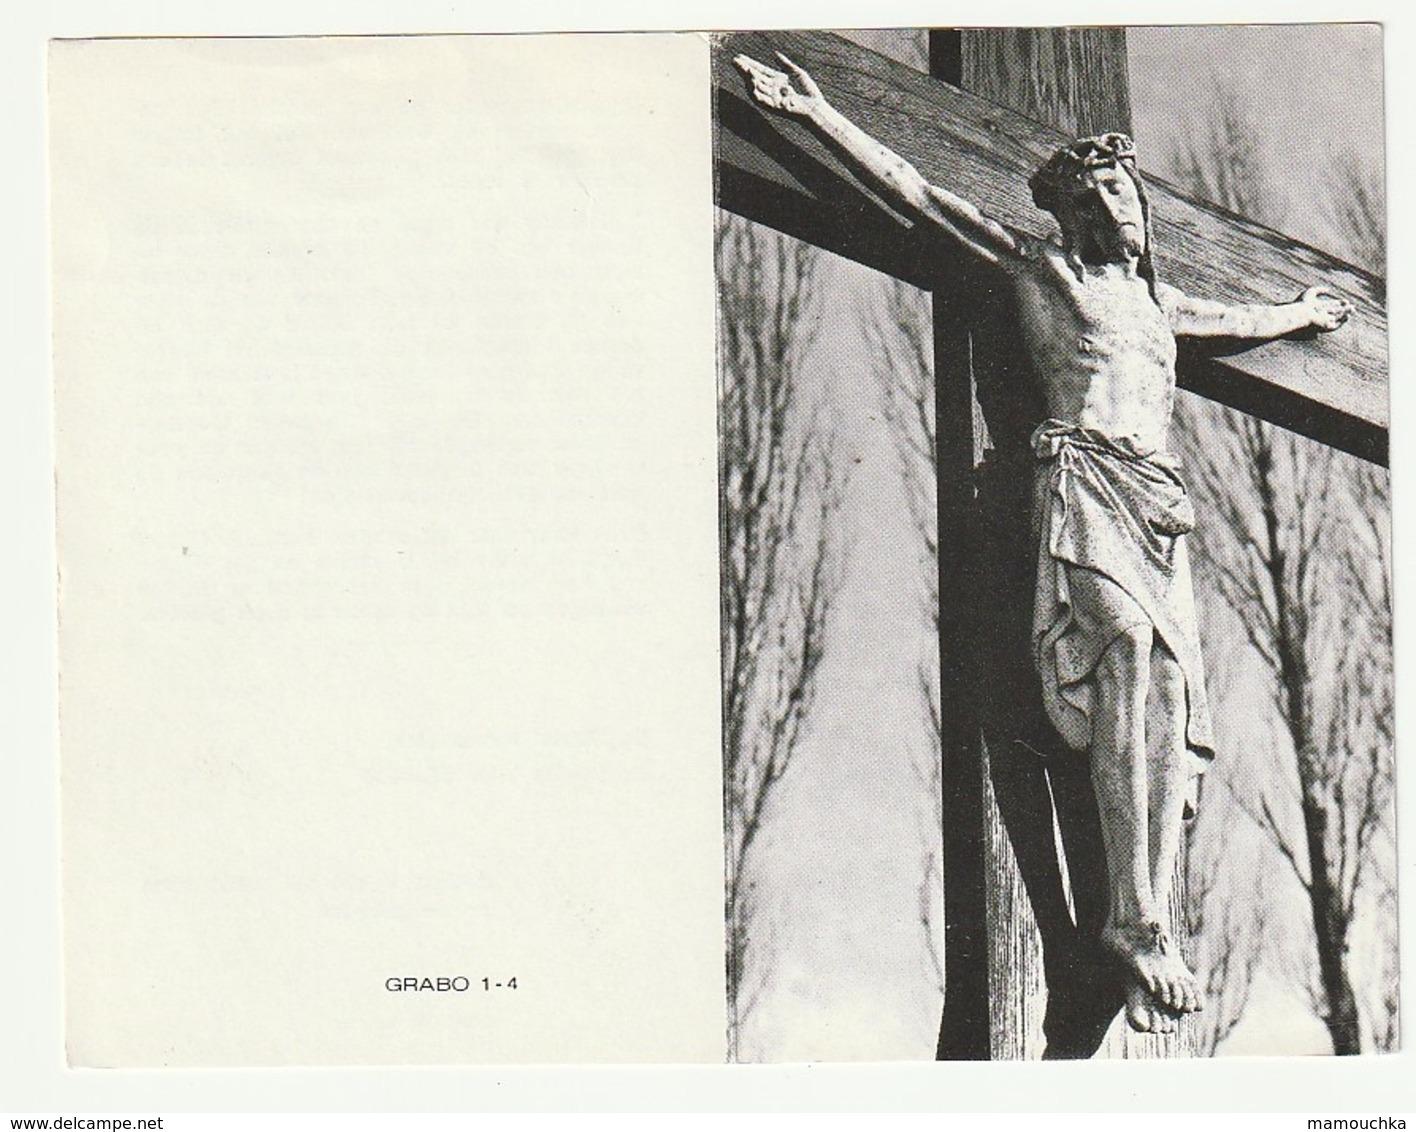 Pater VAN BRANDE Karmeliet Jubilaris St. Niklaas 1892 Priester Brugge Parijs Paris Ieper Berchem 1965 Oudstrijder - Images Religieuses